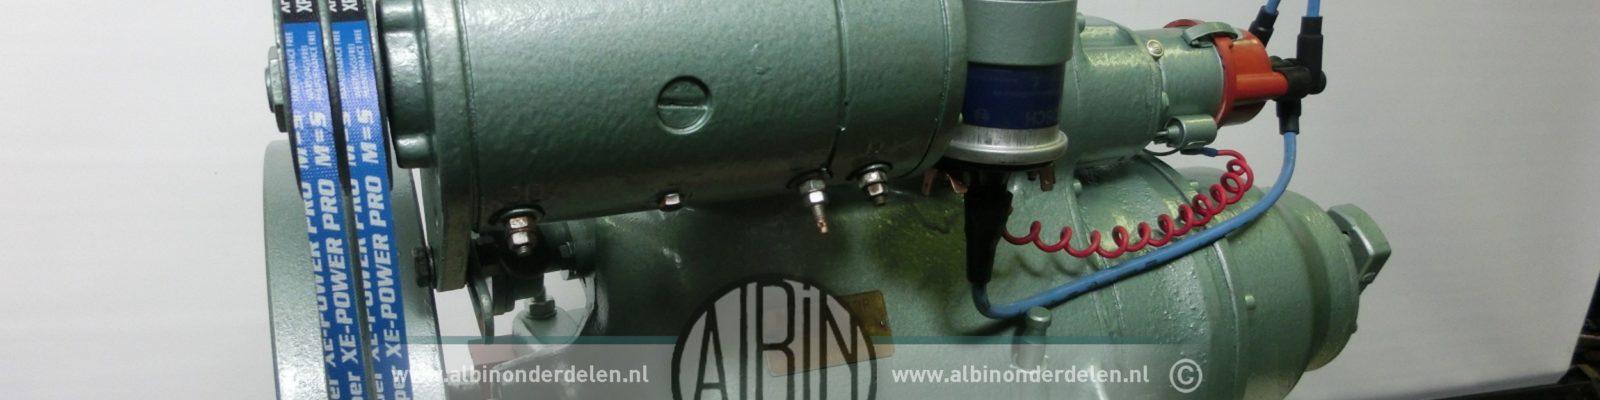 Albin O22